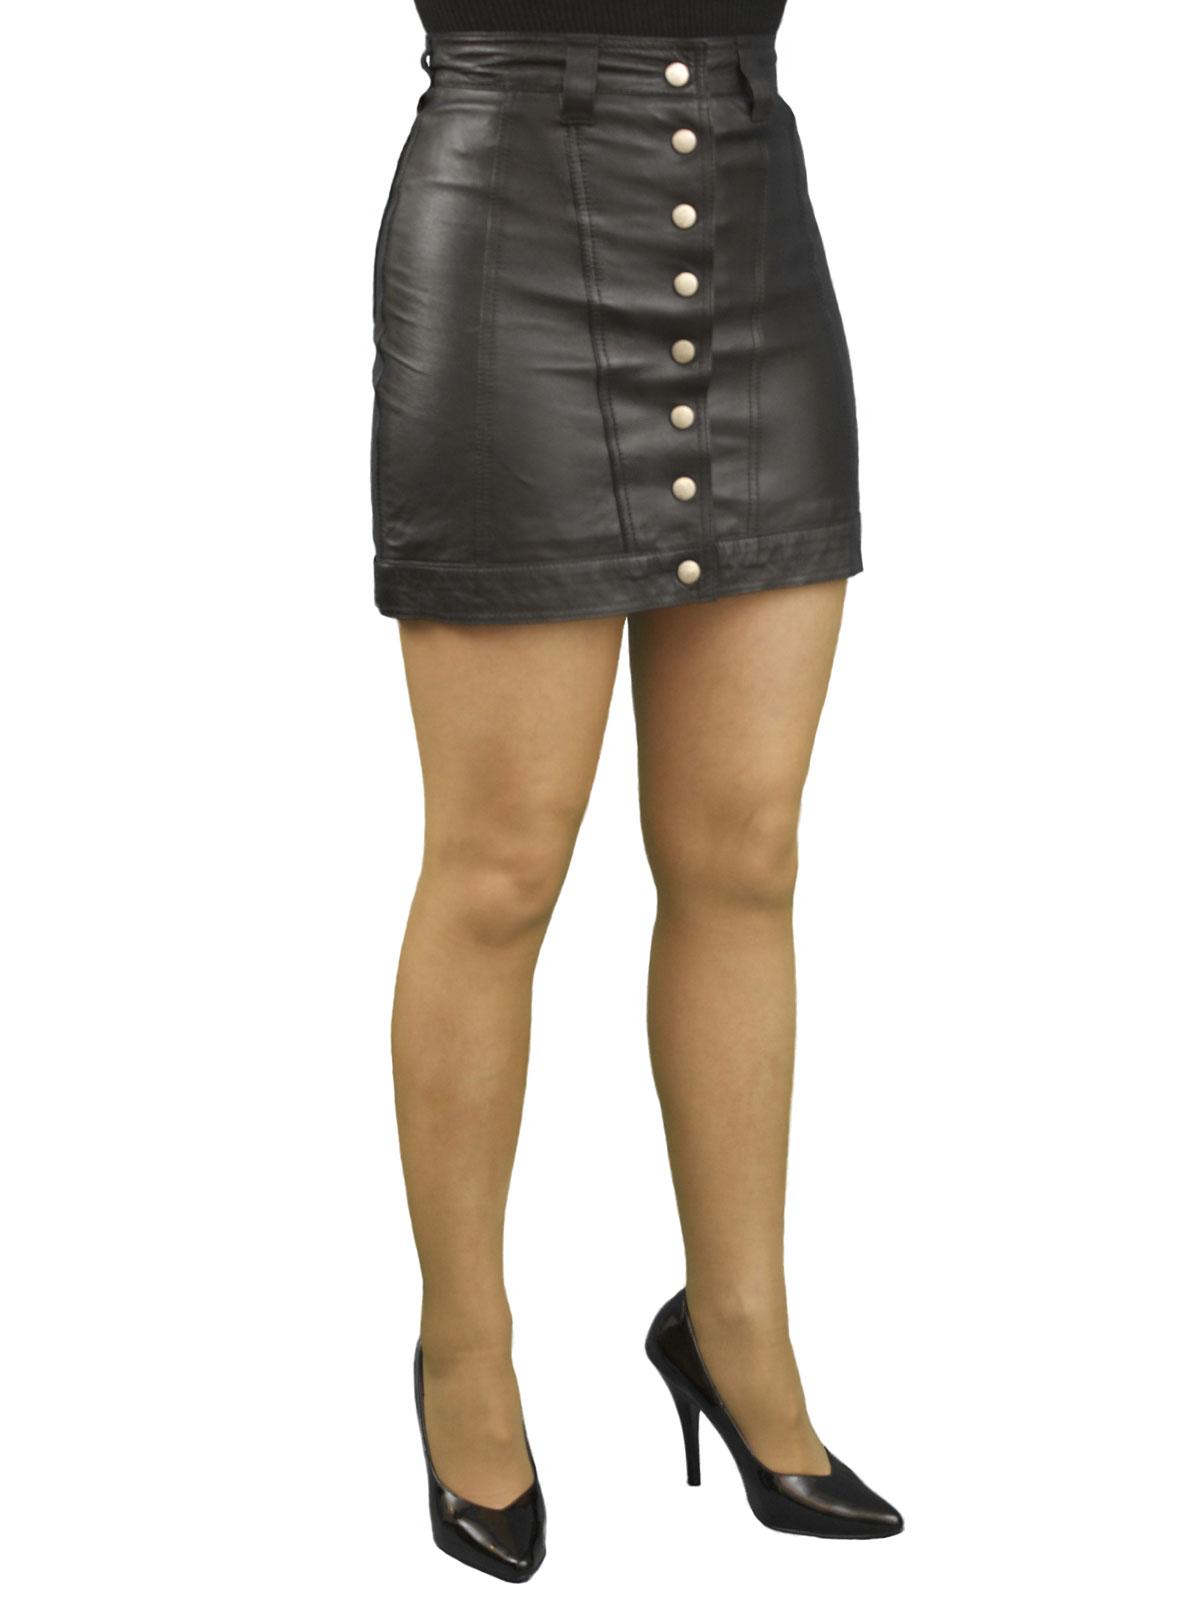 Leather Mini Skirt, Front Stud Opening - Tout Ensemble